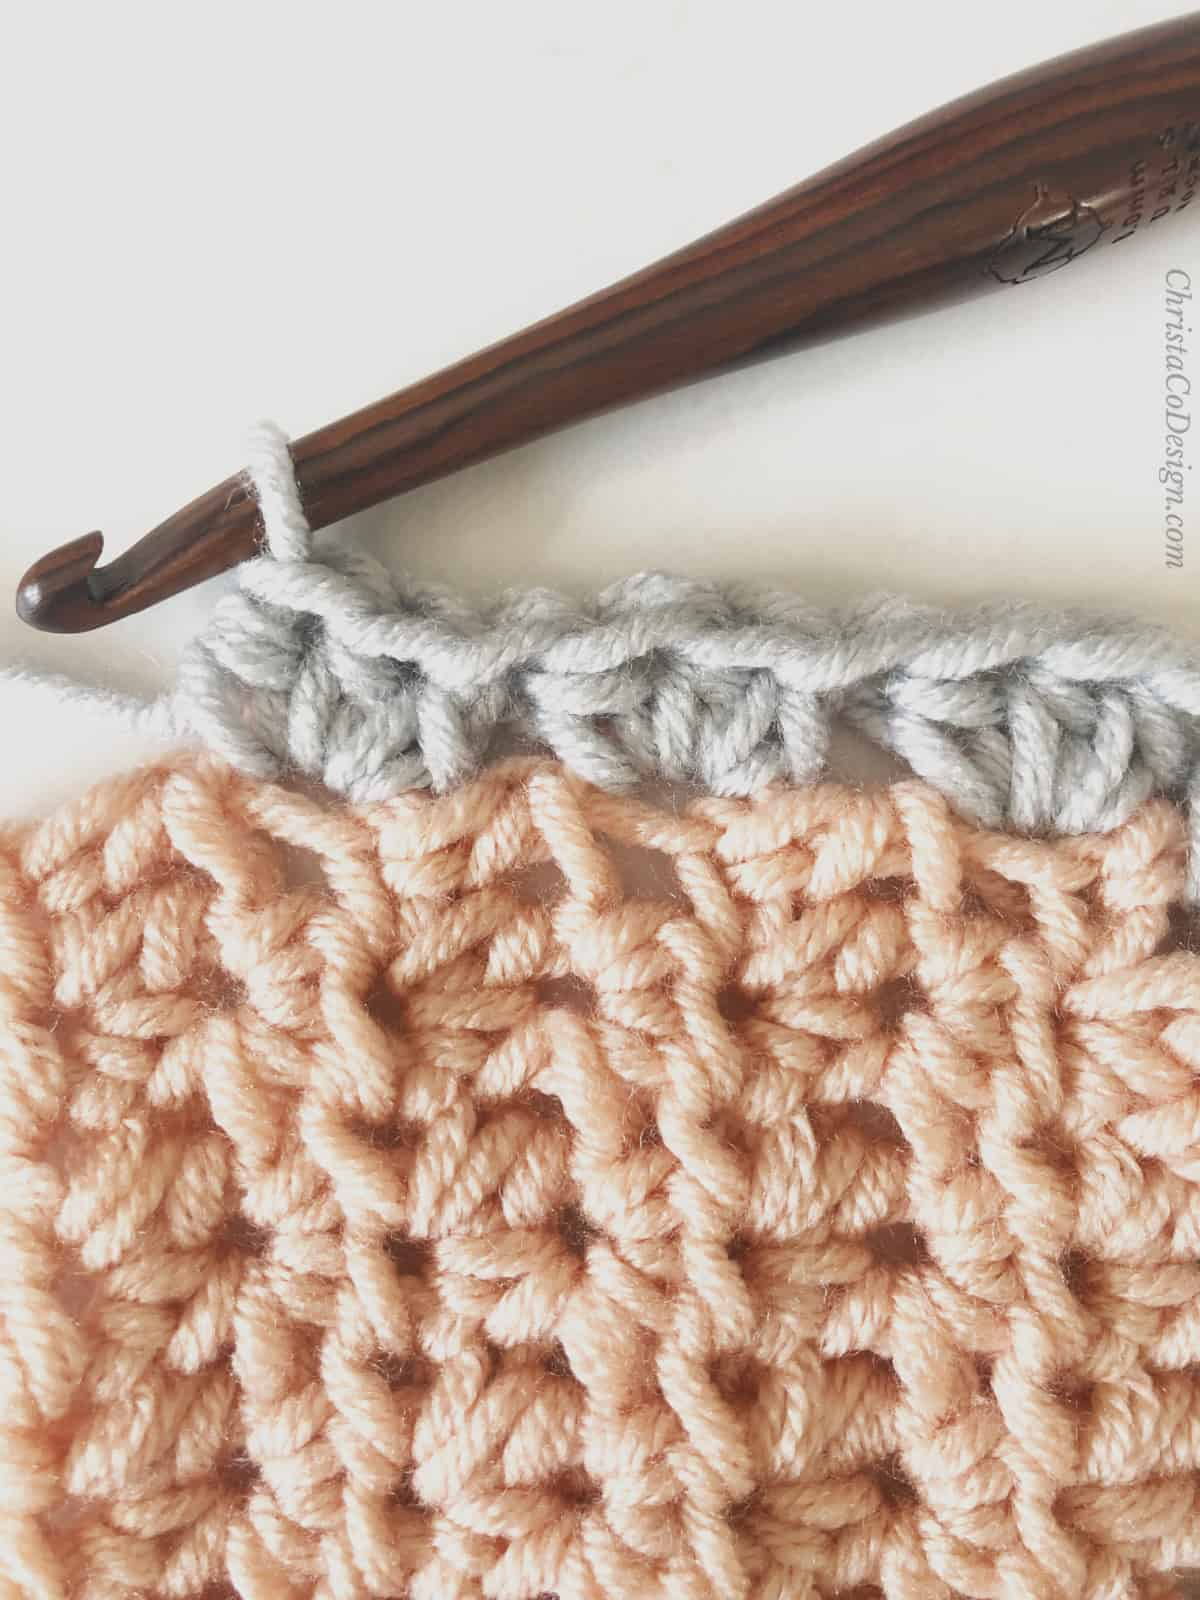 picture of hdc border crochet blanket